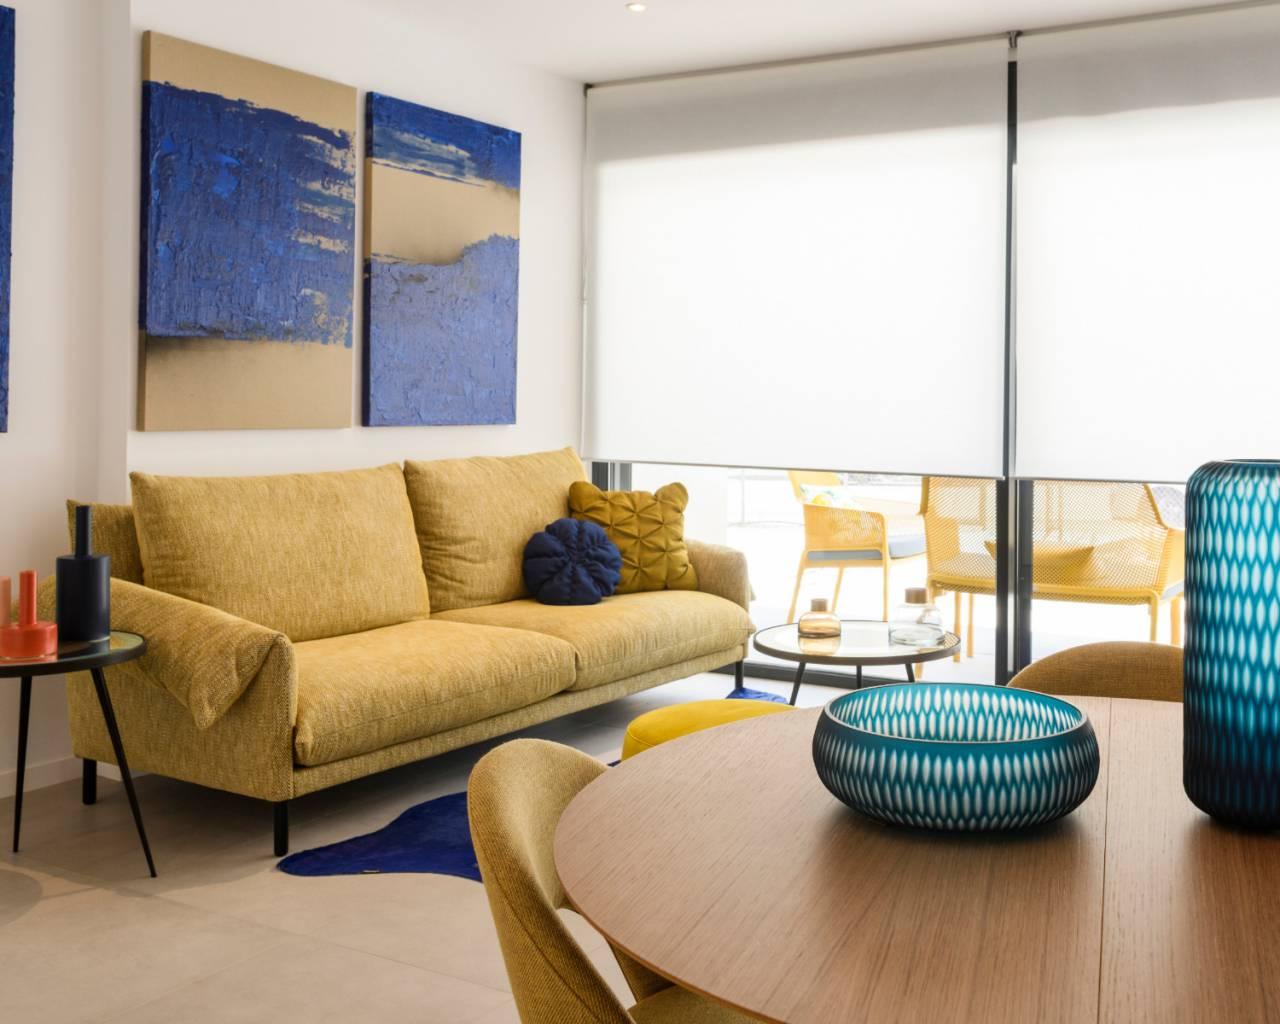 nieuwbouw-appartement-orihuela-costa-campoamor_5594_xl